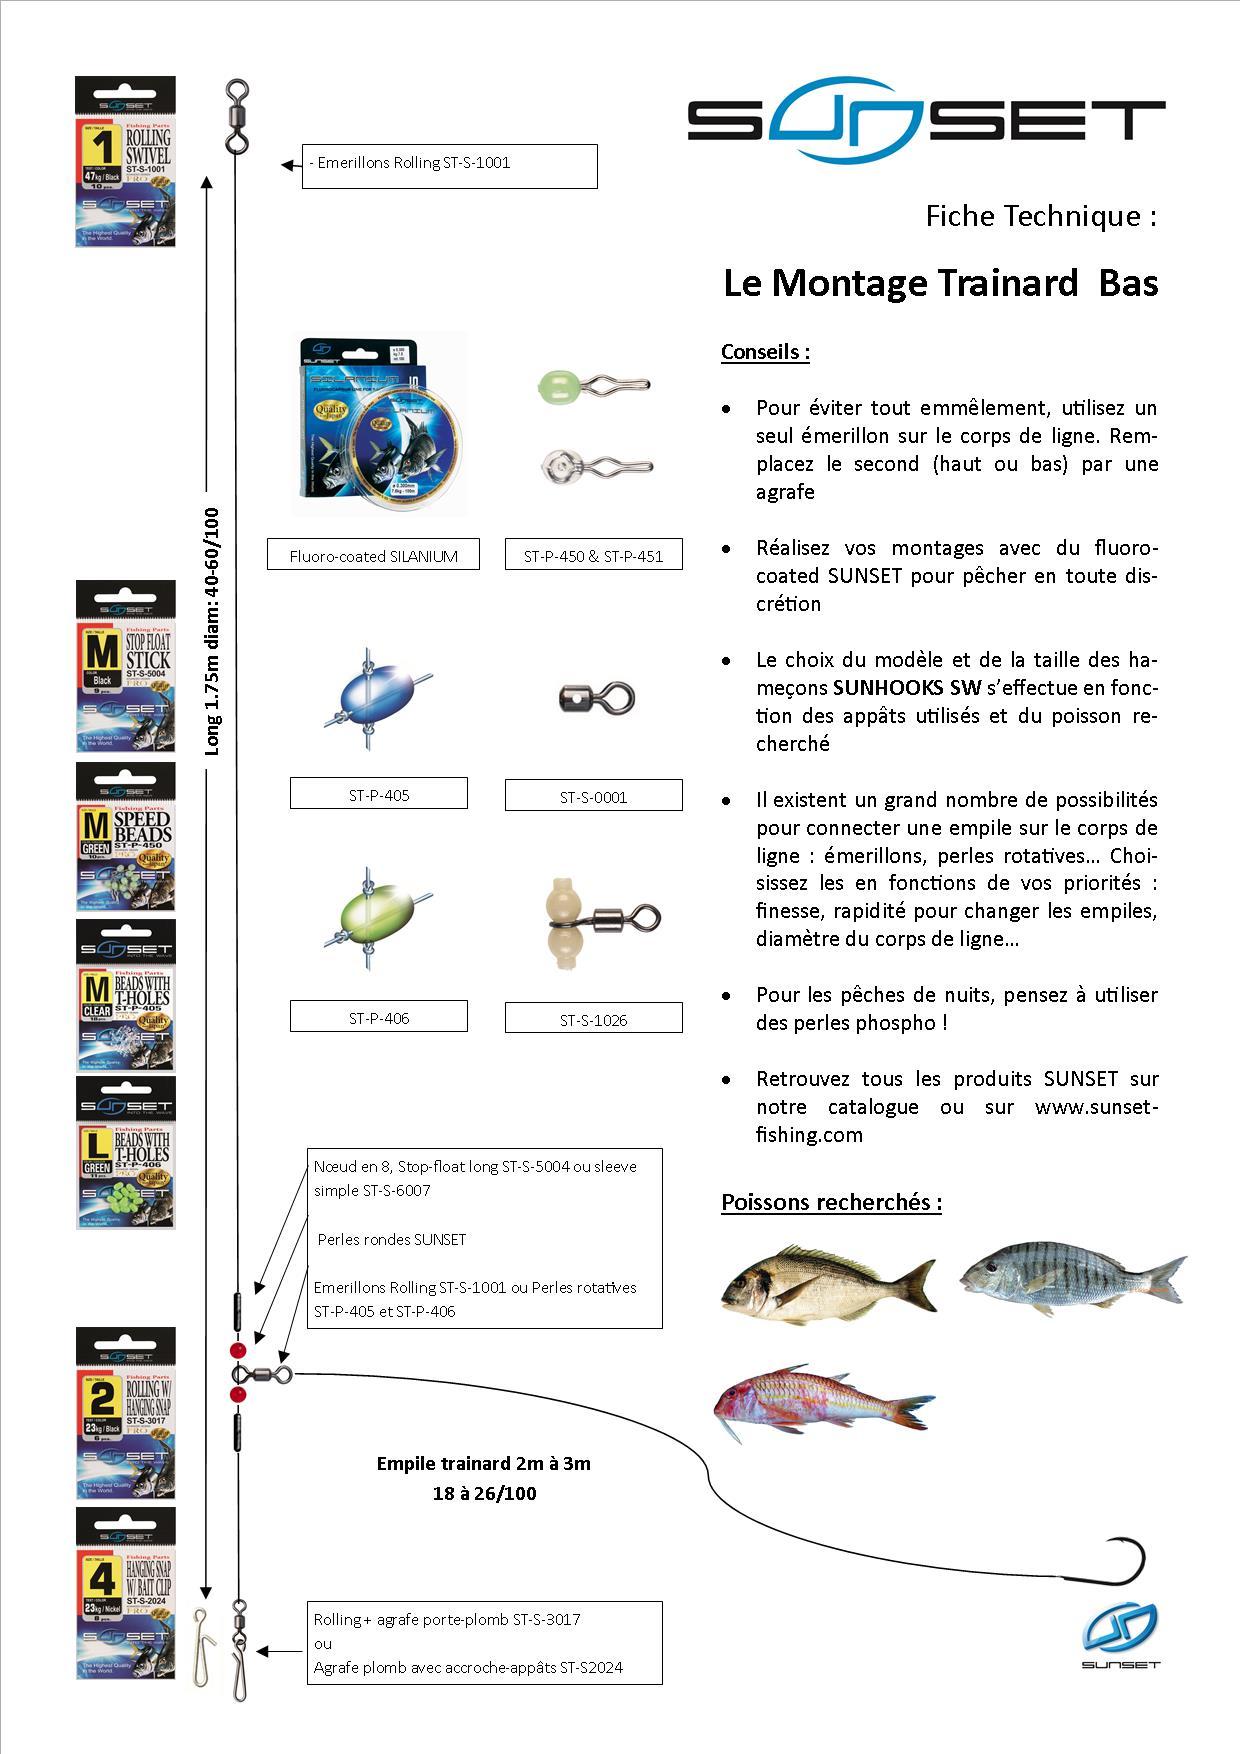 4-LE MONTAGE TRAINARD BAS.jpg